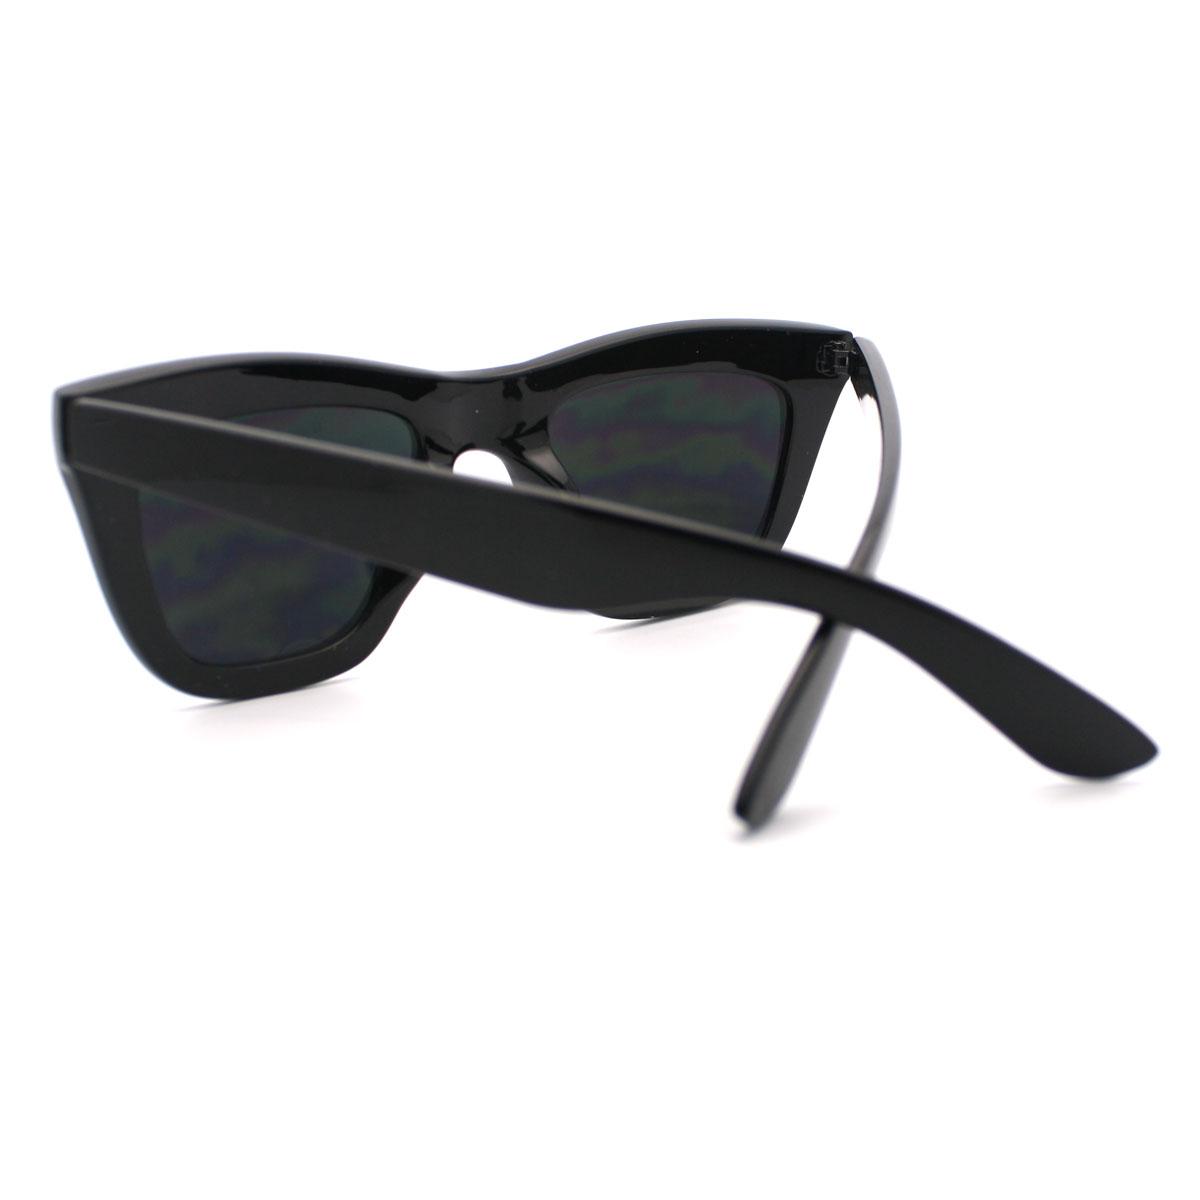 b7666e99332 Super Dark Womens Sunglasses « Heritage Malta